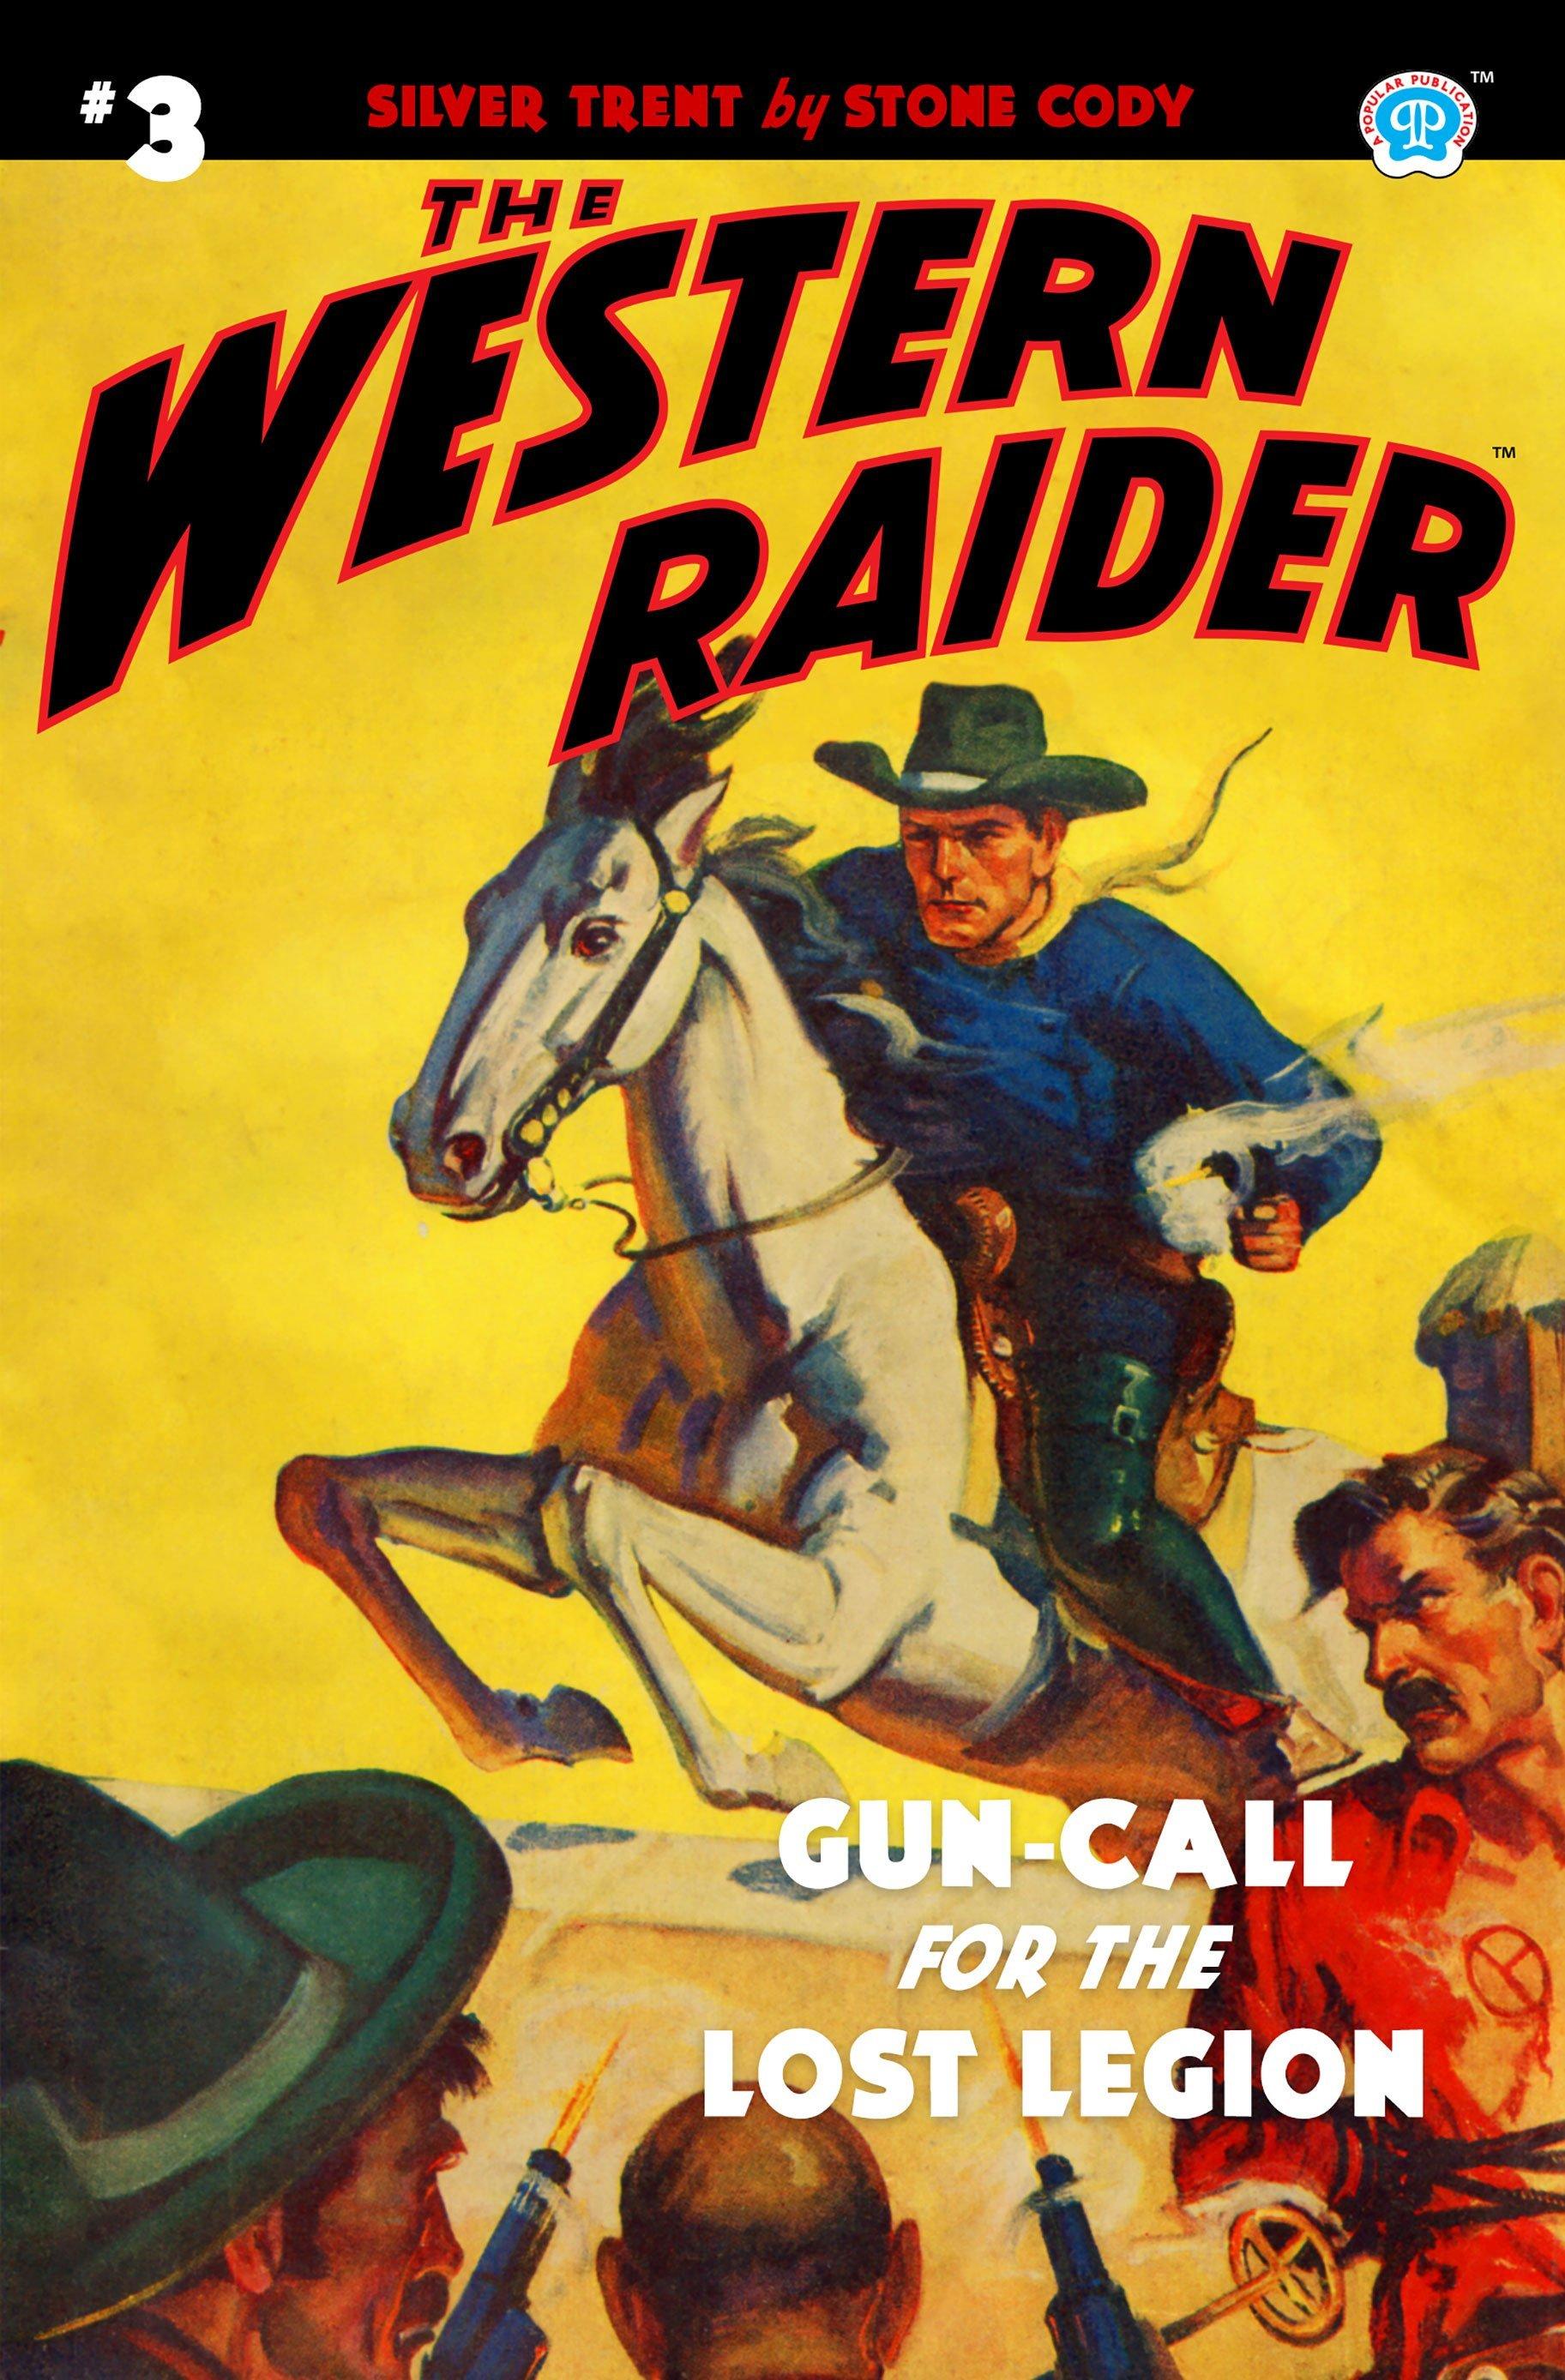 The Western Raider #3: Gun-Call for the Lost Legion